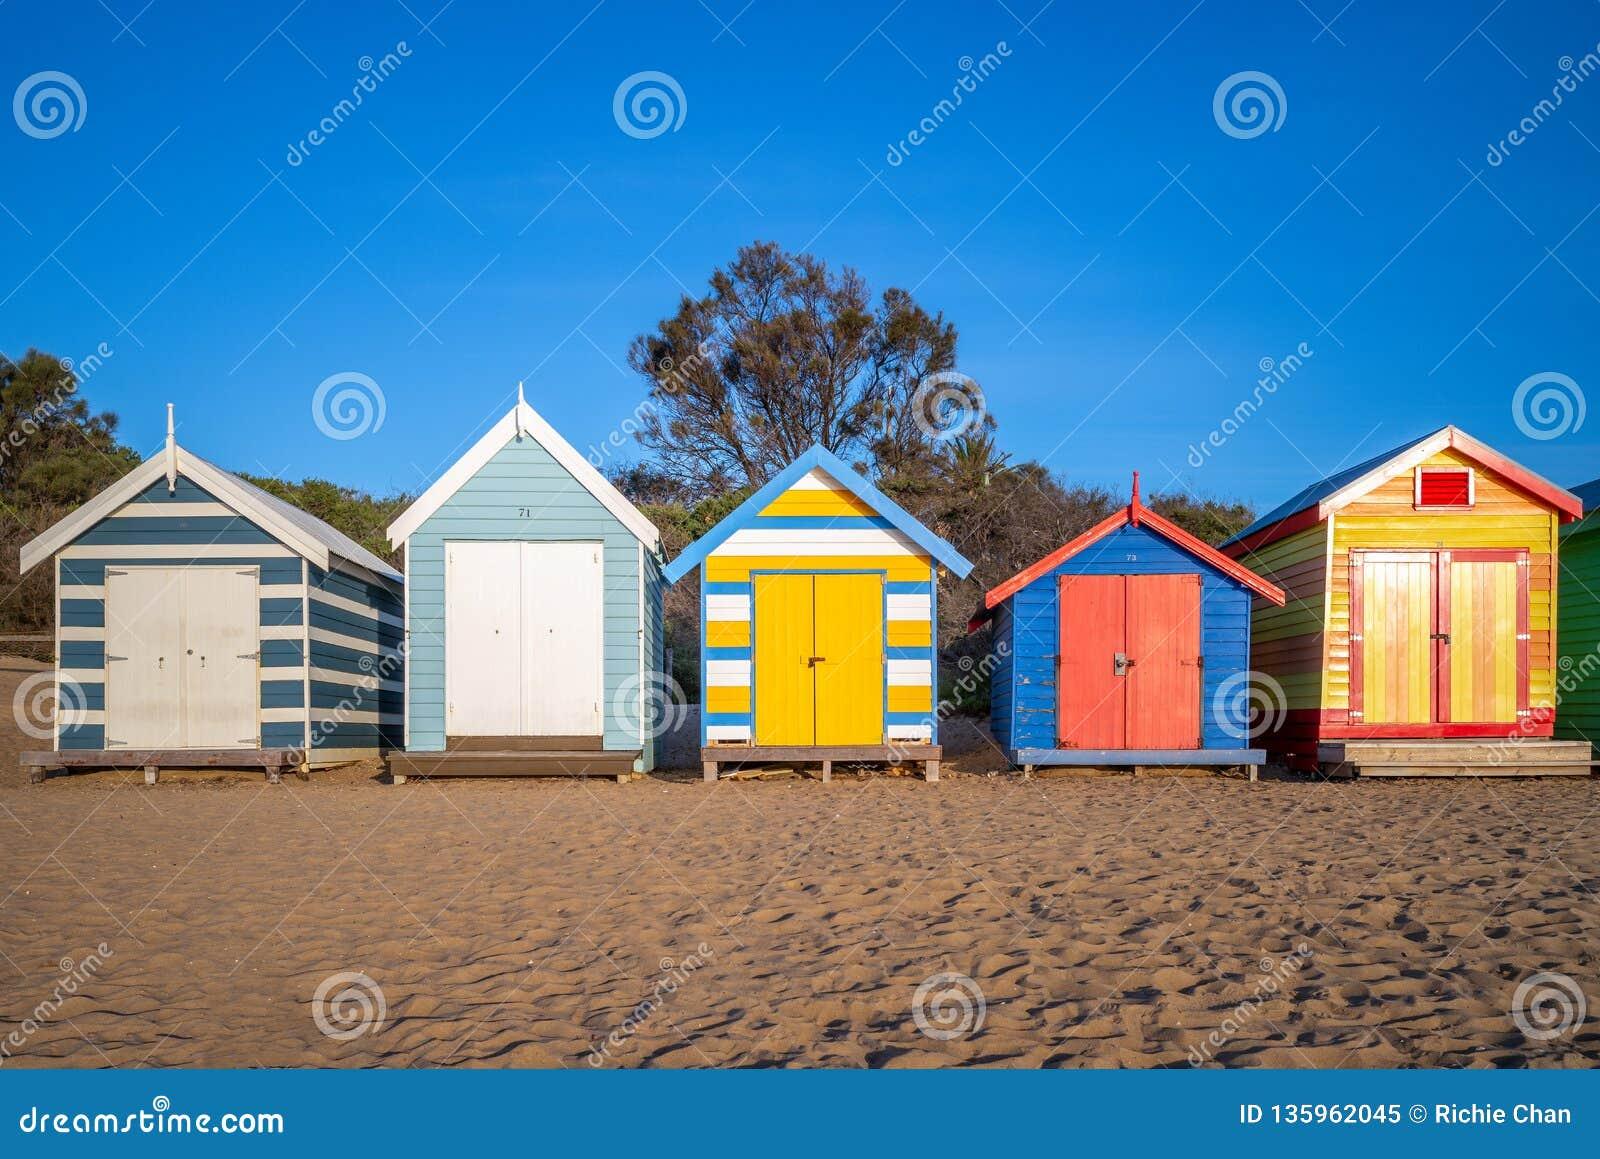 Brighton Bathing Boxes in Melbourne, Australië